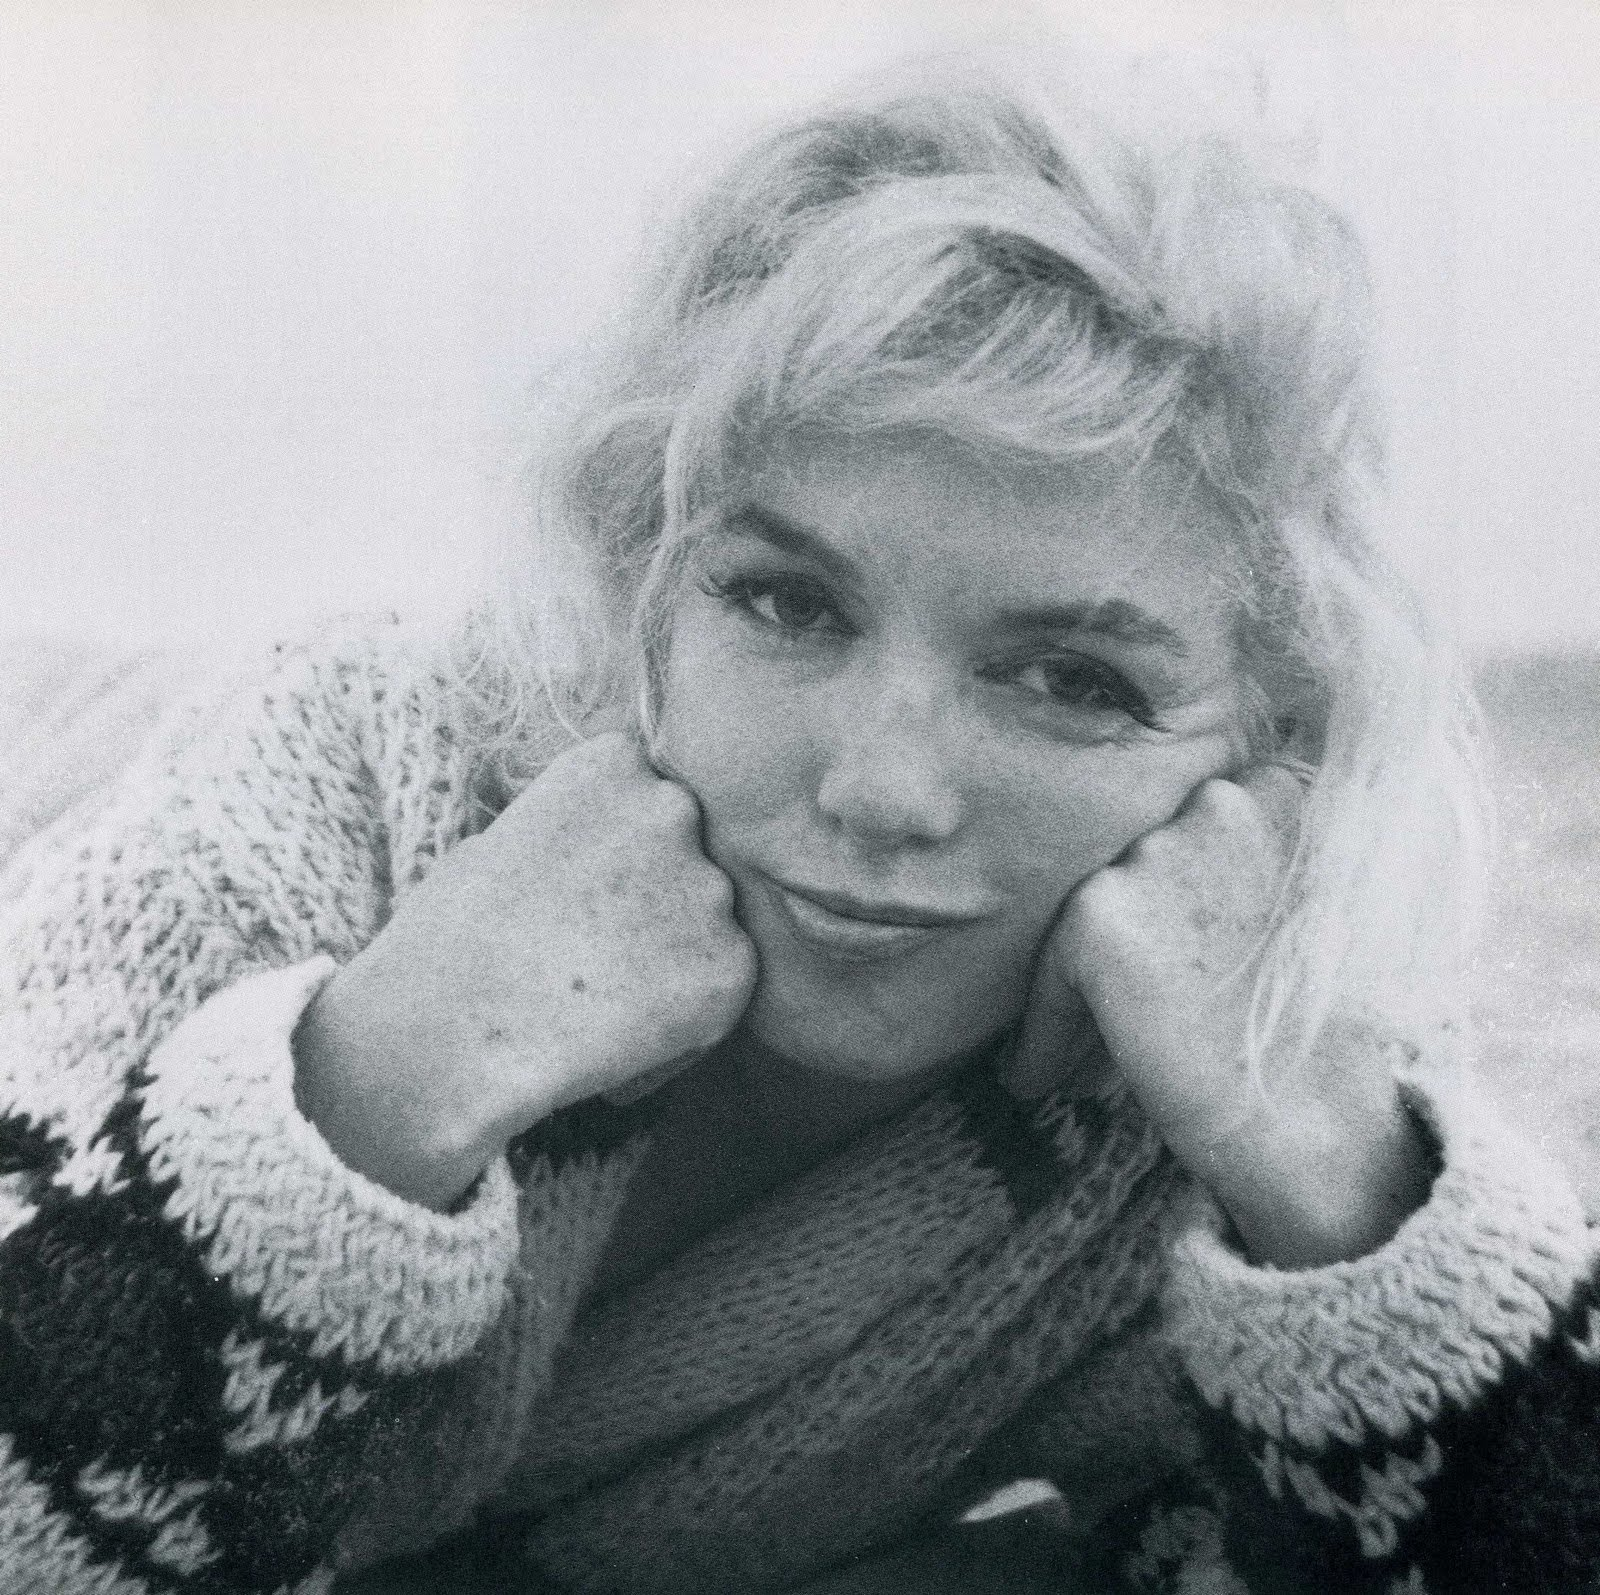 http://4.bp.blogspot.com/-wmqYNlVAsqA/TiOc6YozzQI/AAAAAAAAB4I/x5DhMds93b4/s1600/Marilyn+Monroe+by+George+Barris.jpg